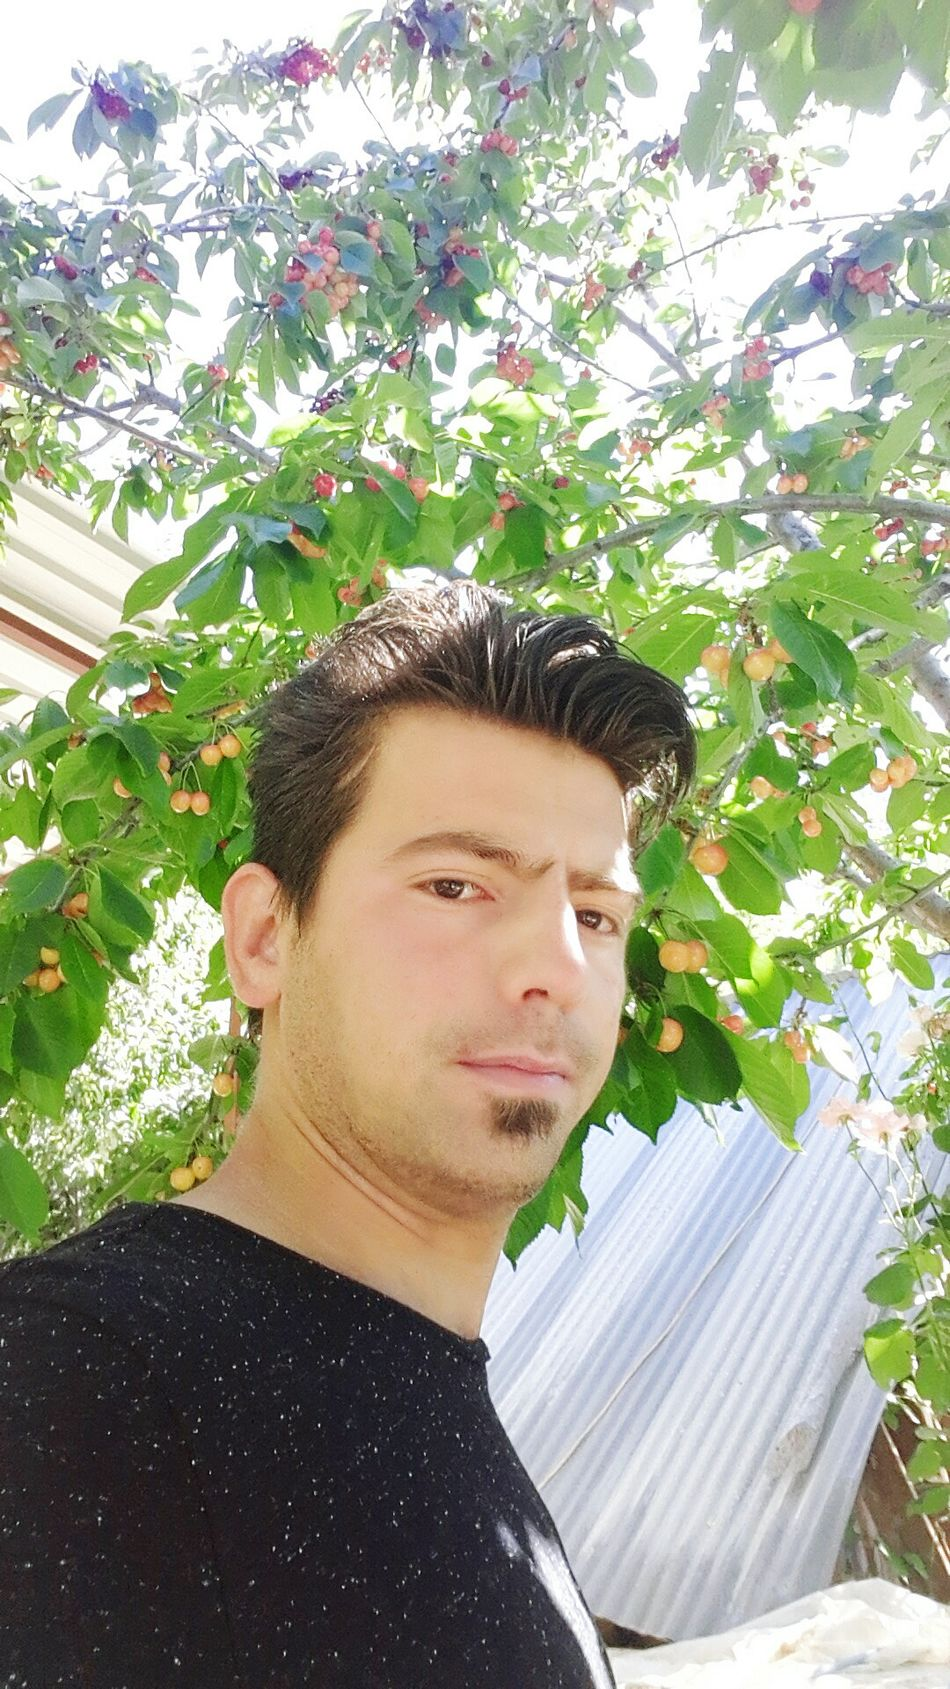 Selfie ✌ Good Day Beuty Selfie Hi! Sexyme Very Hot Selfies Beatiful Sexys Todays Hot Look Hot That's Me Kik Me!!!!!  Beauty Kik #me #kikme #kik Kik Me ♥ Sexyboy Sweet